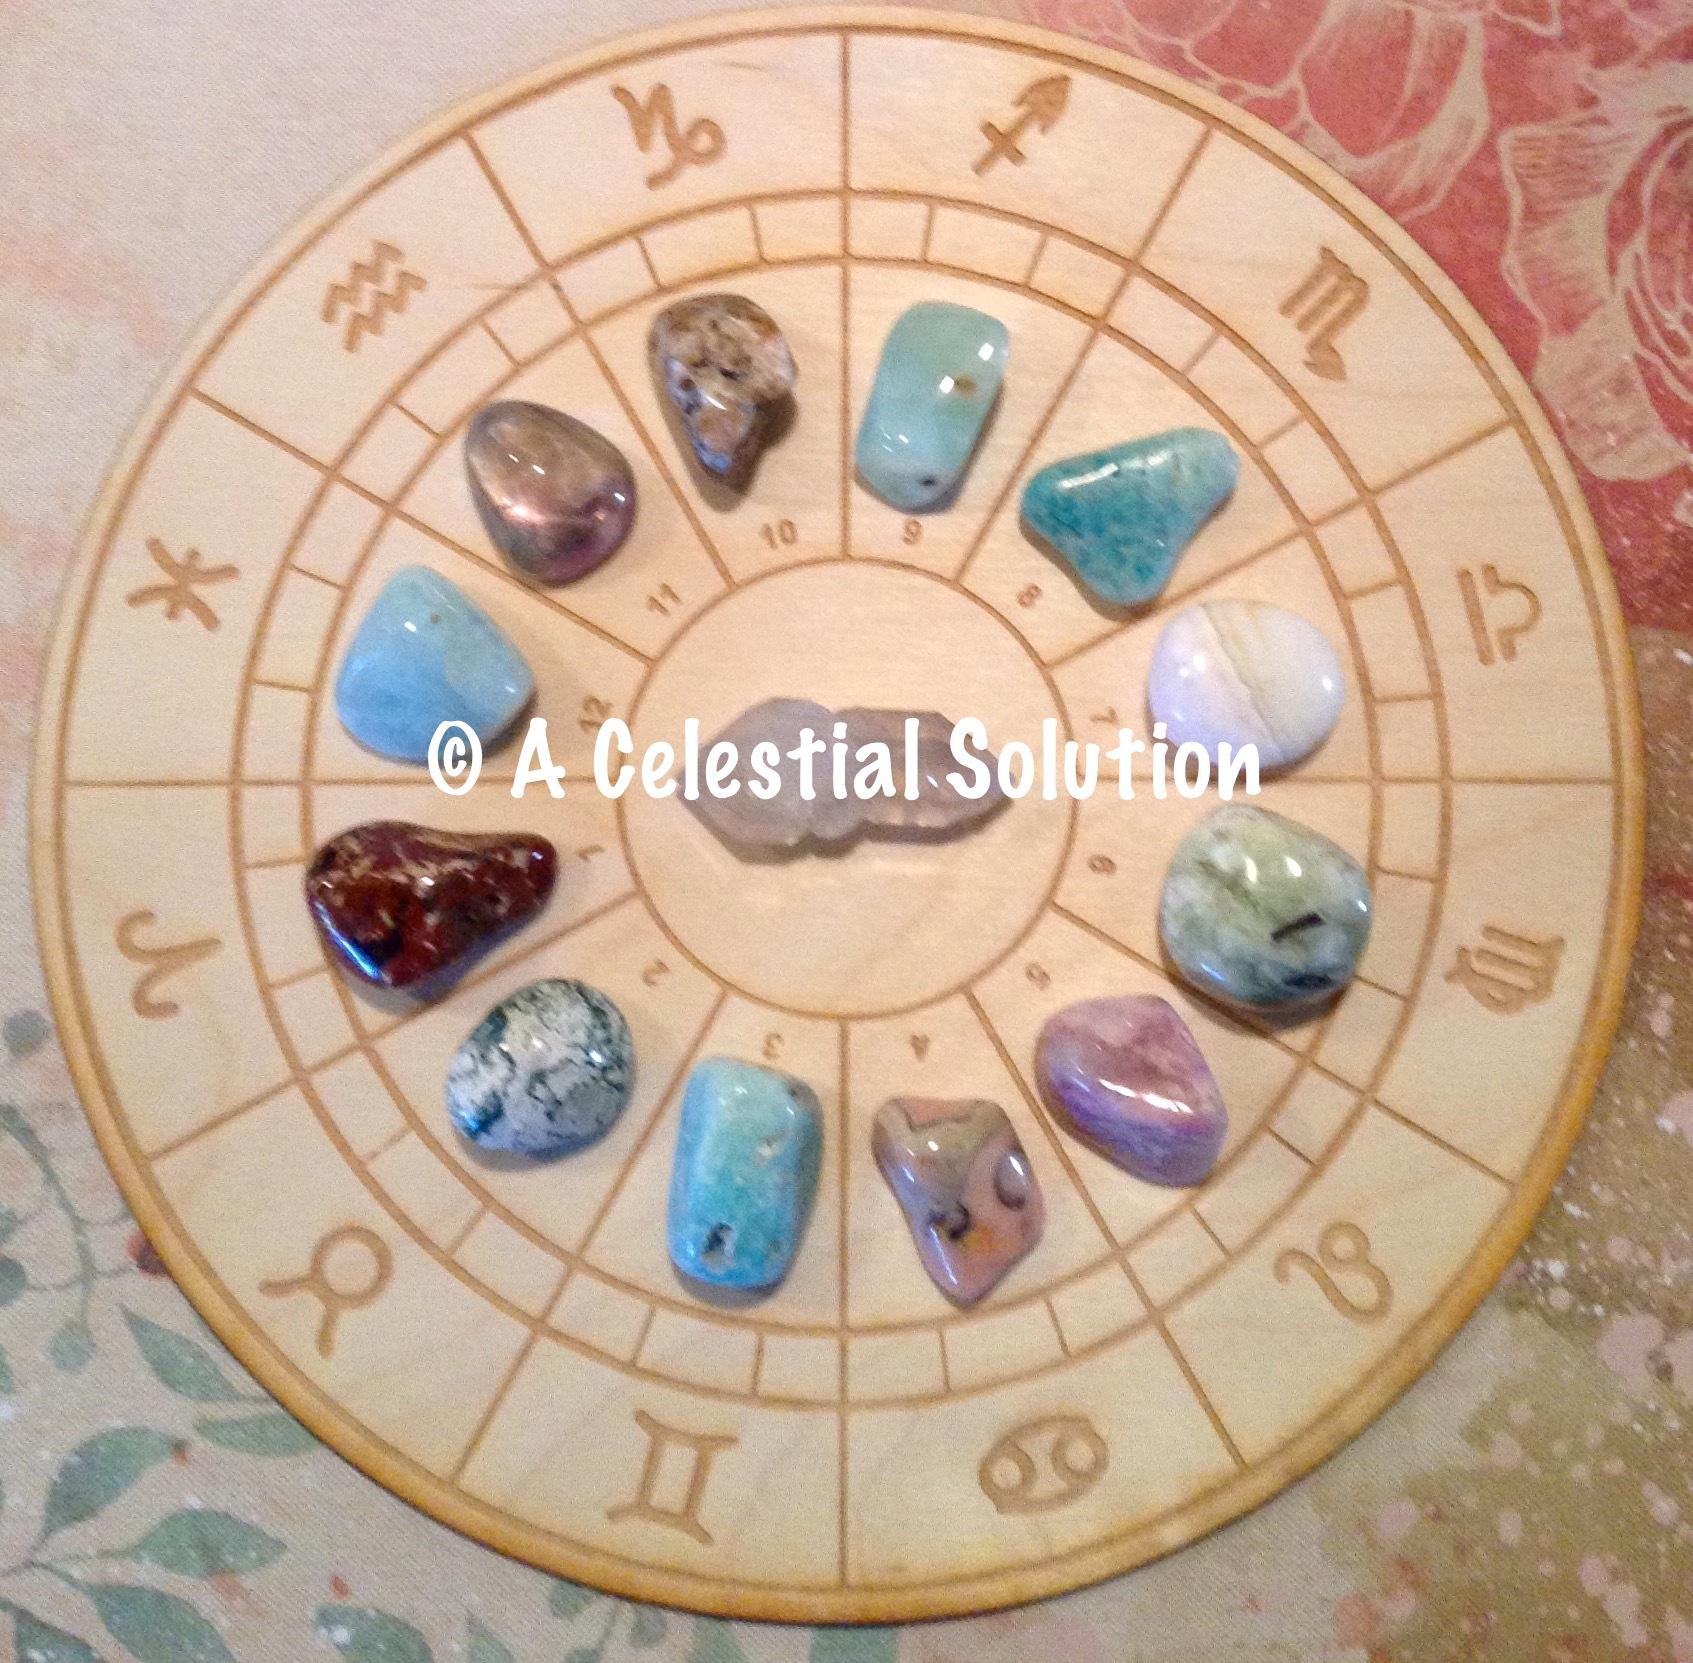 astrology medium grid copyright.jpg